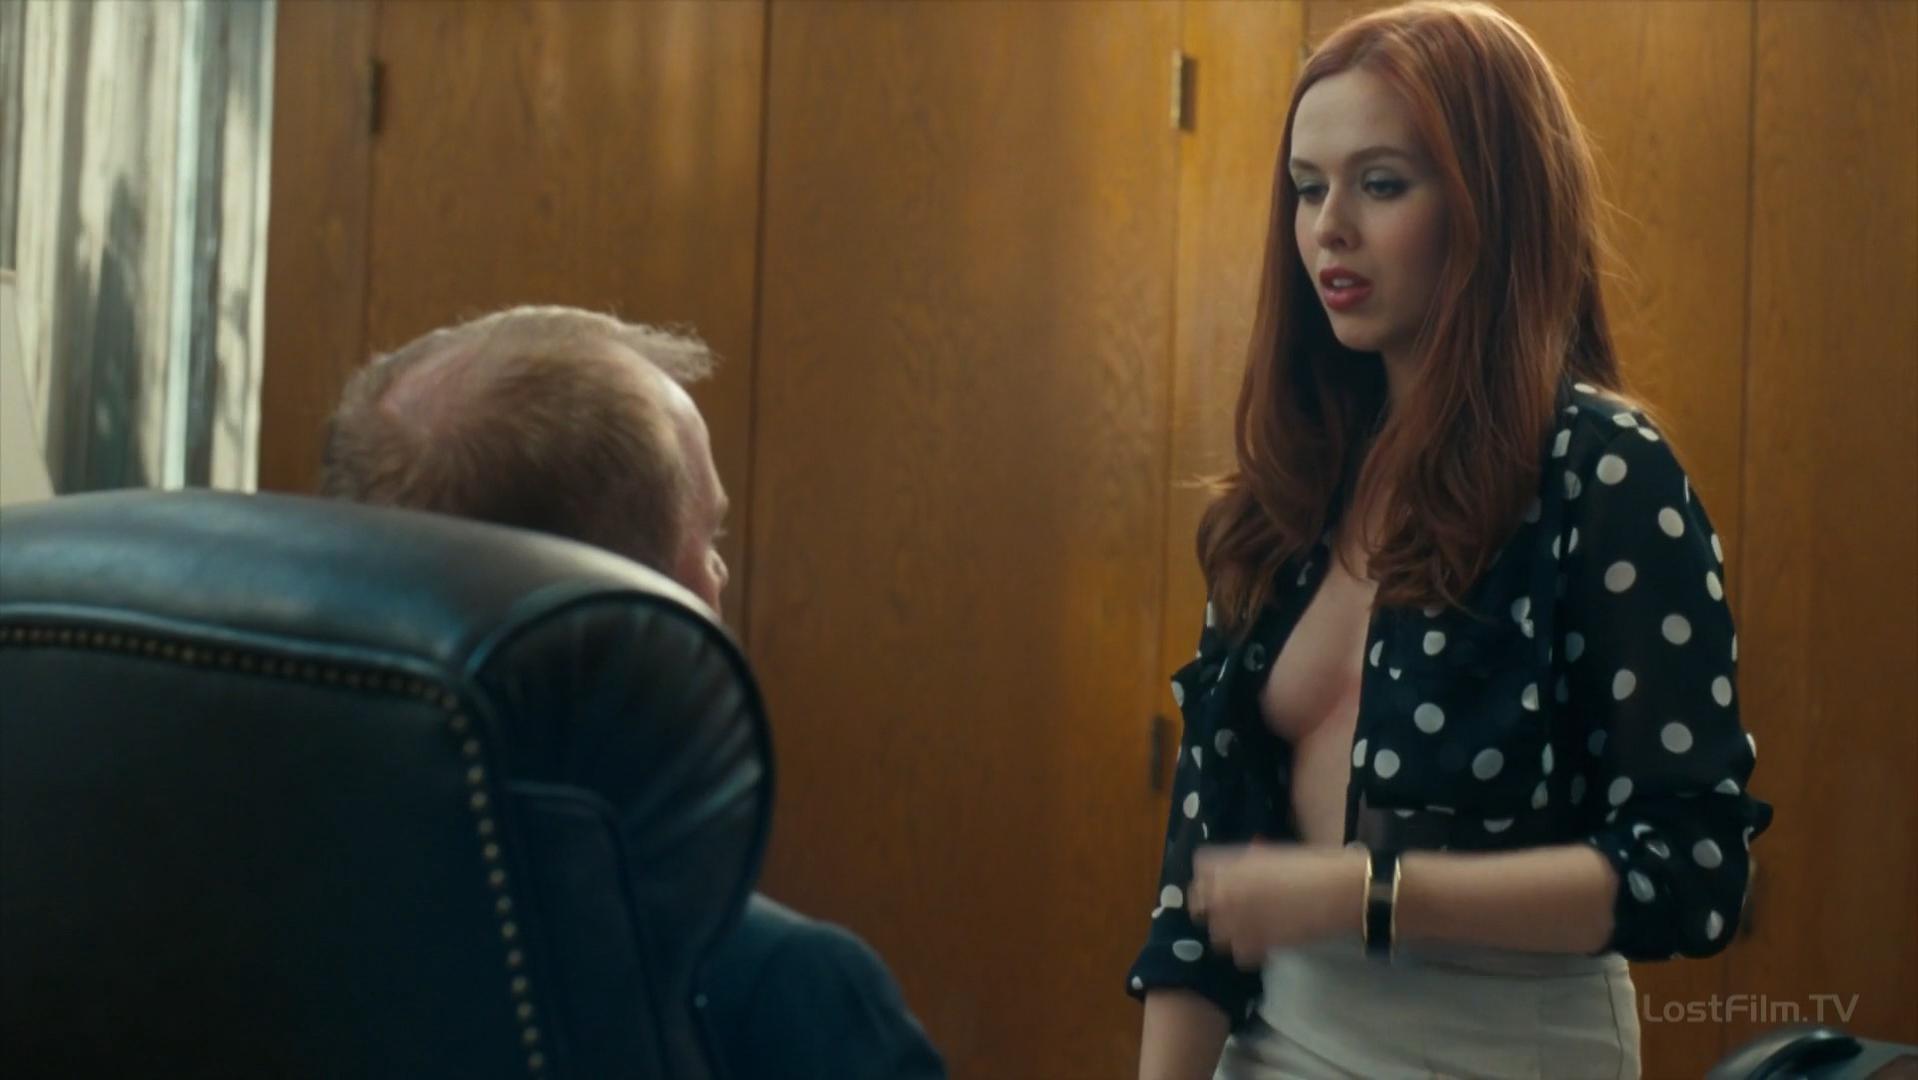 Yvonne strahovski nude scene in louie scandalplanetcom - 3 part 5